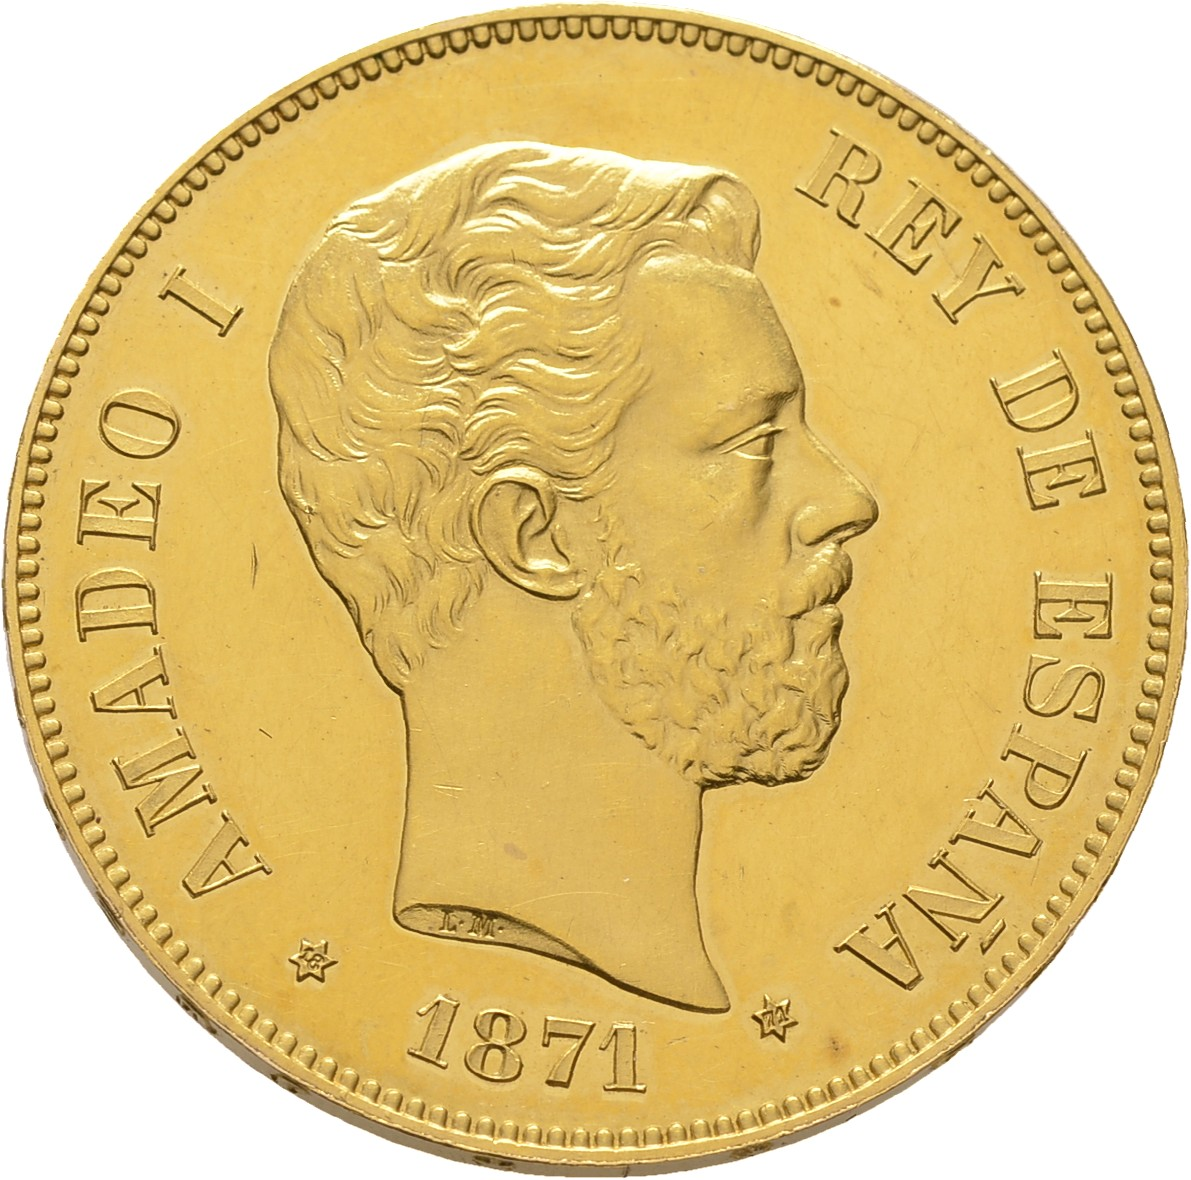 Amadeo I de Saboya 100 pesetas